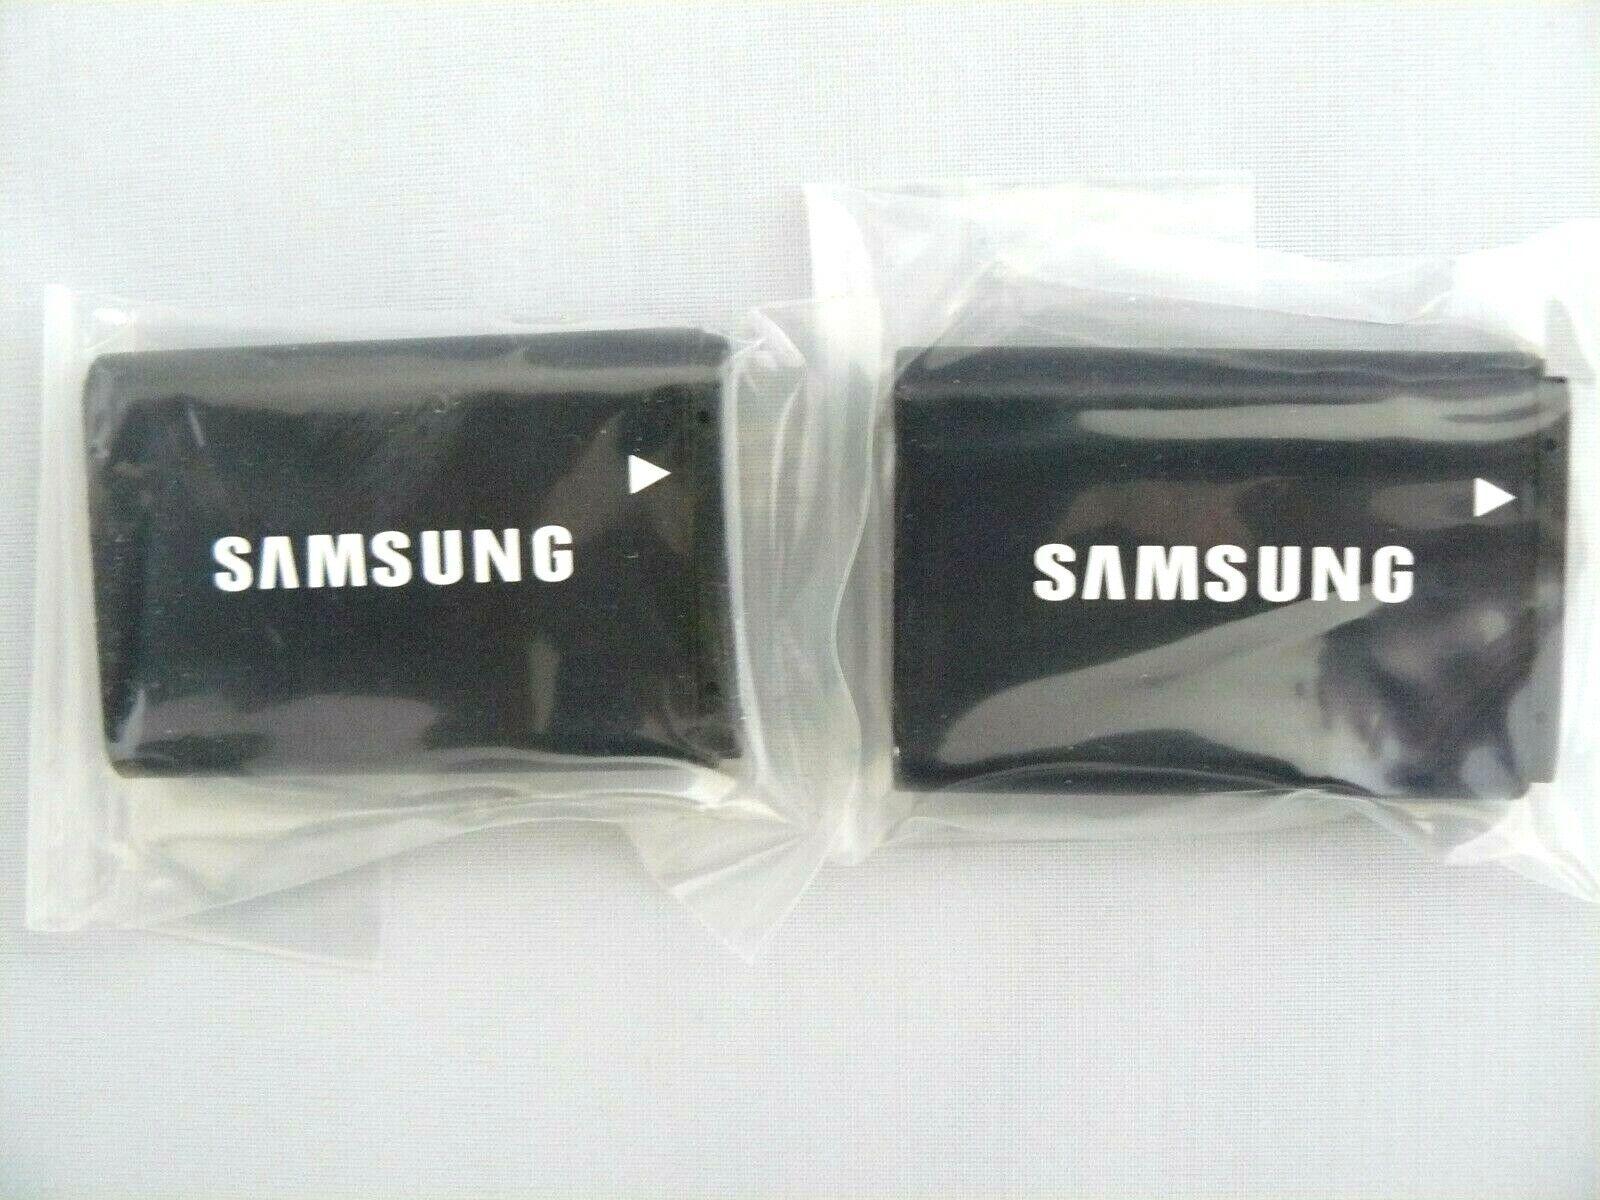 (Lot of 2) NEW OEM AB923446BA SAMSUNG EXTENDED BATTERIES FOR U620 A870 U340